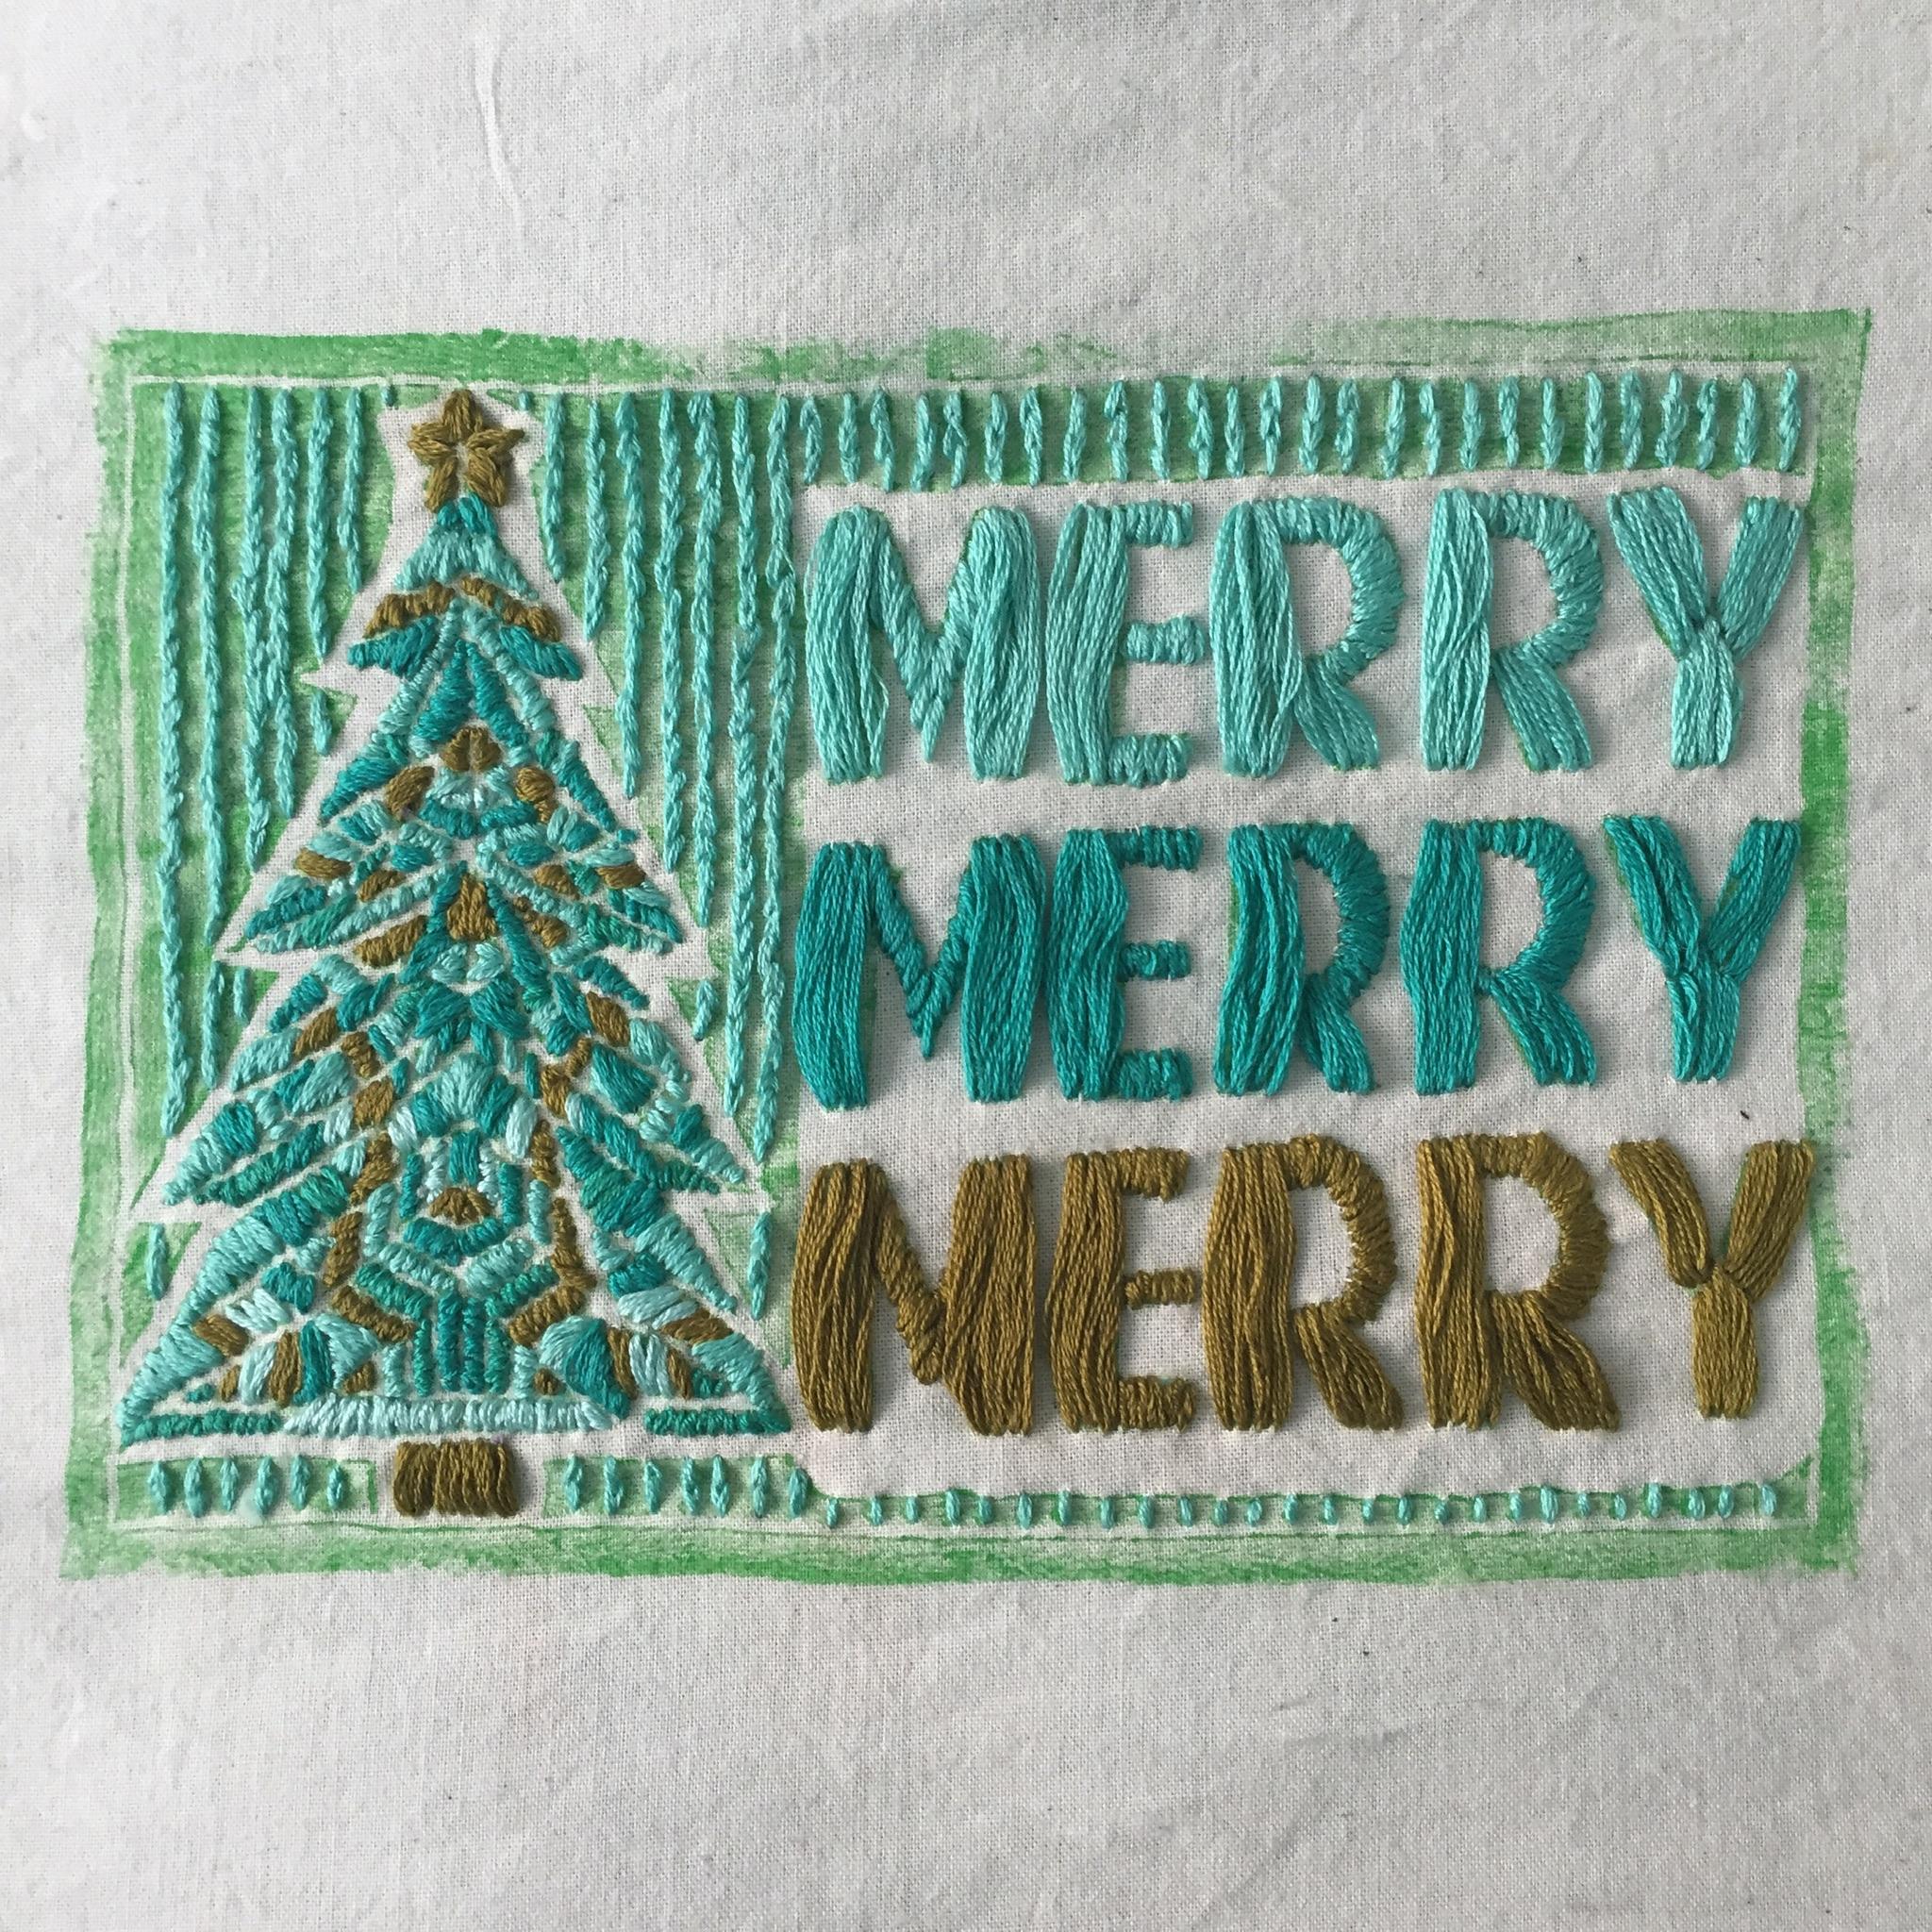 Merry_Christmas_embroidery.JPG